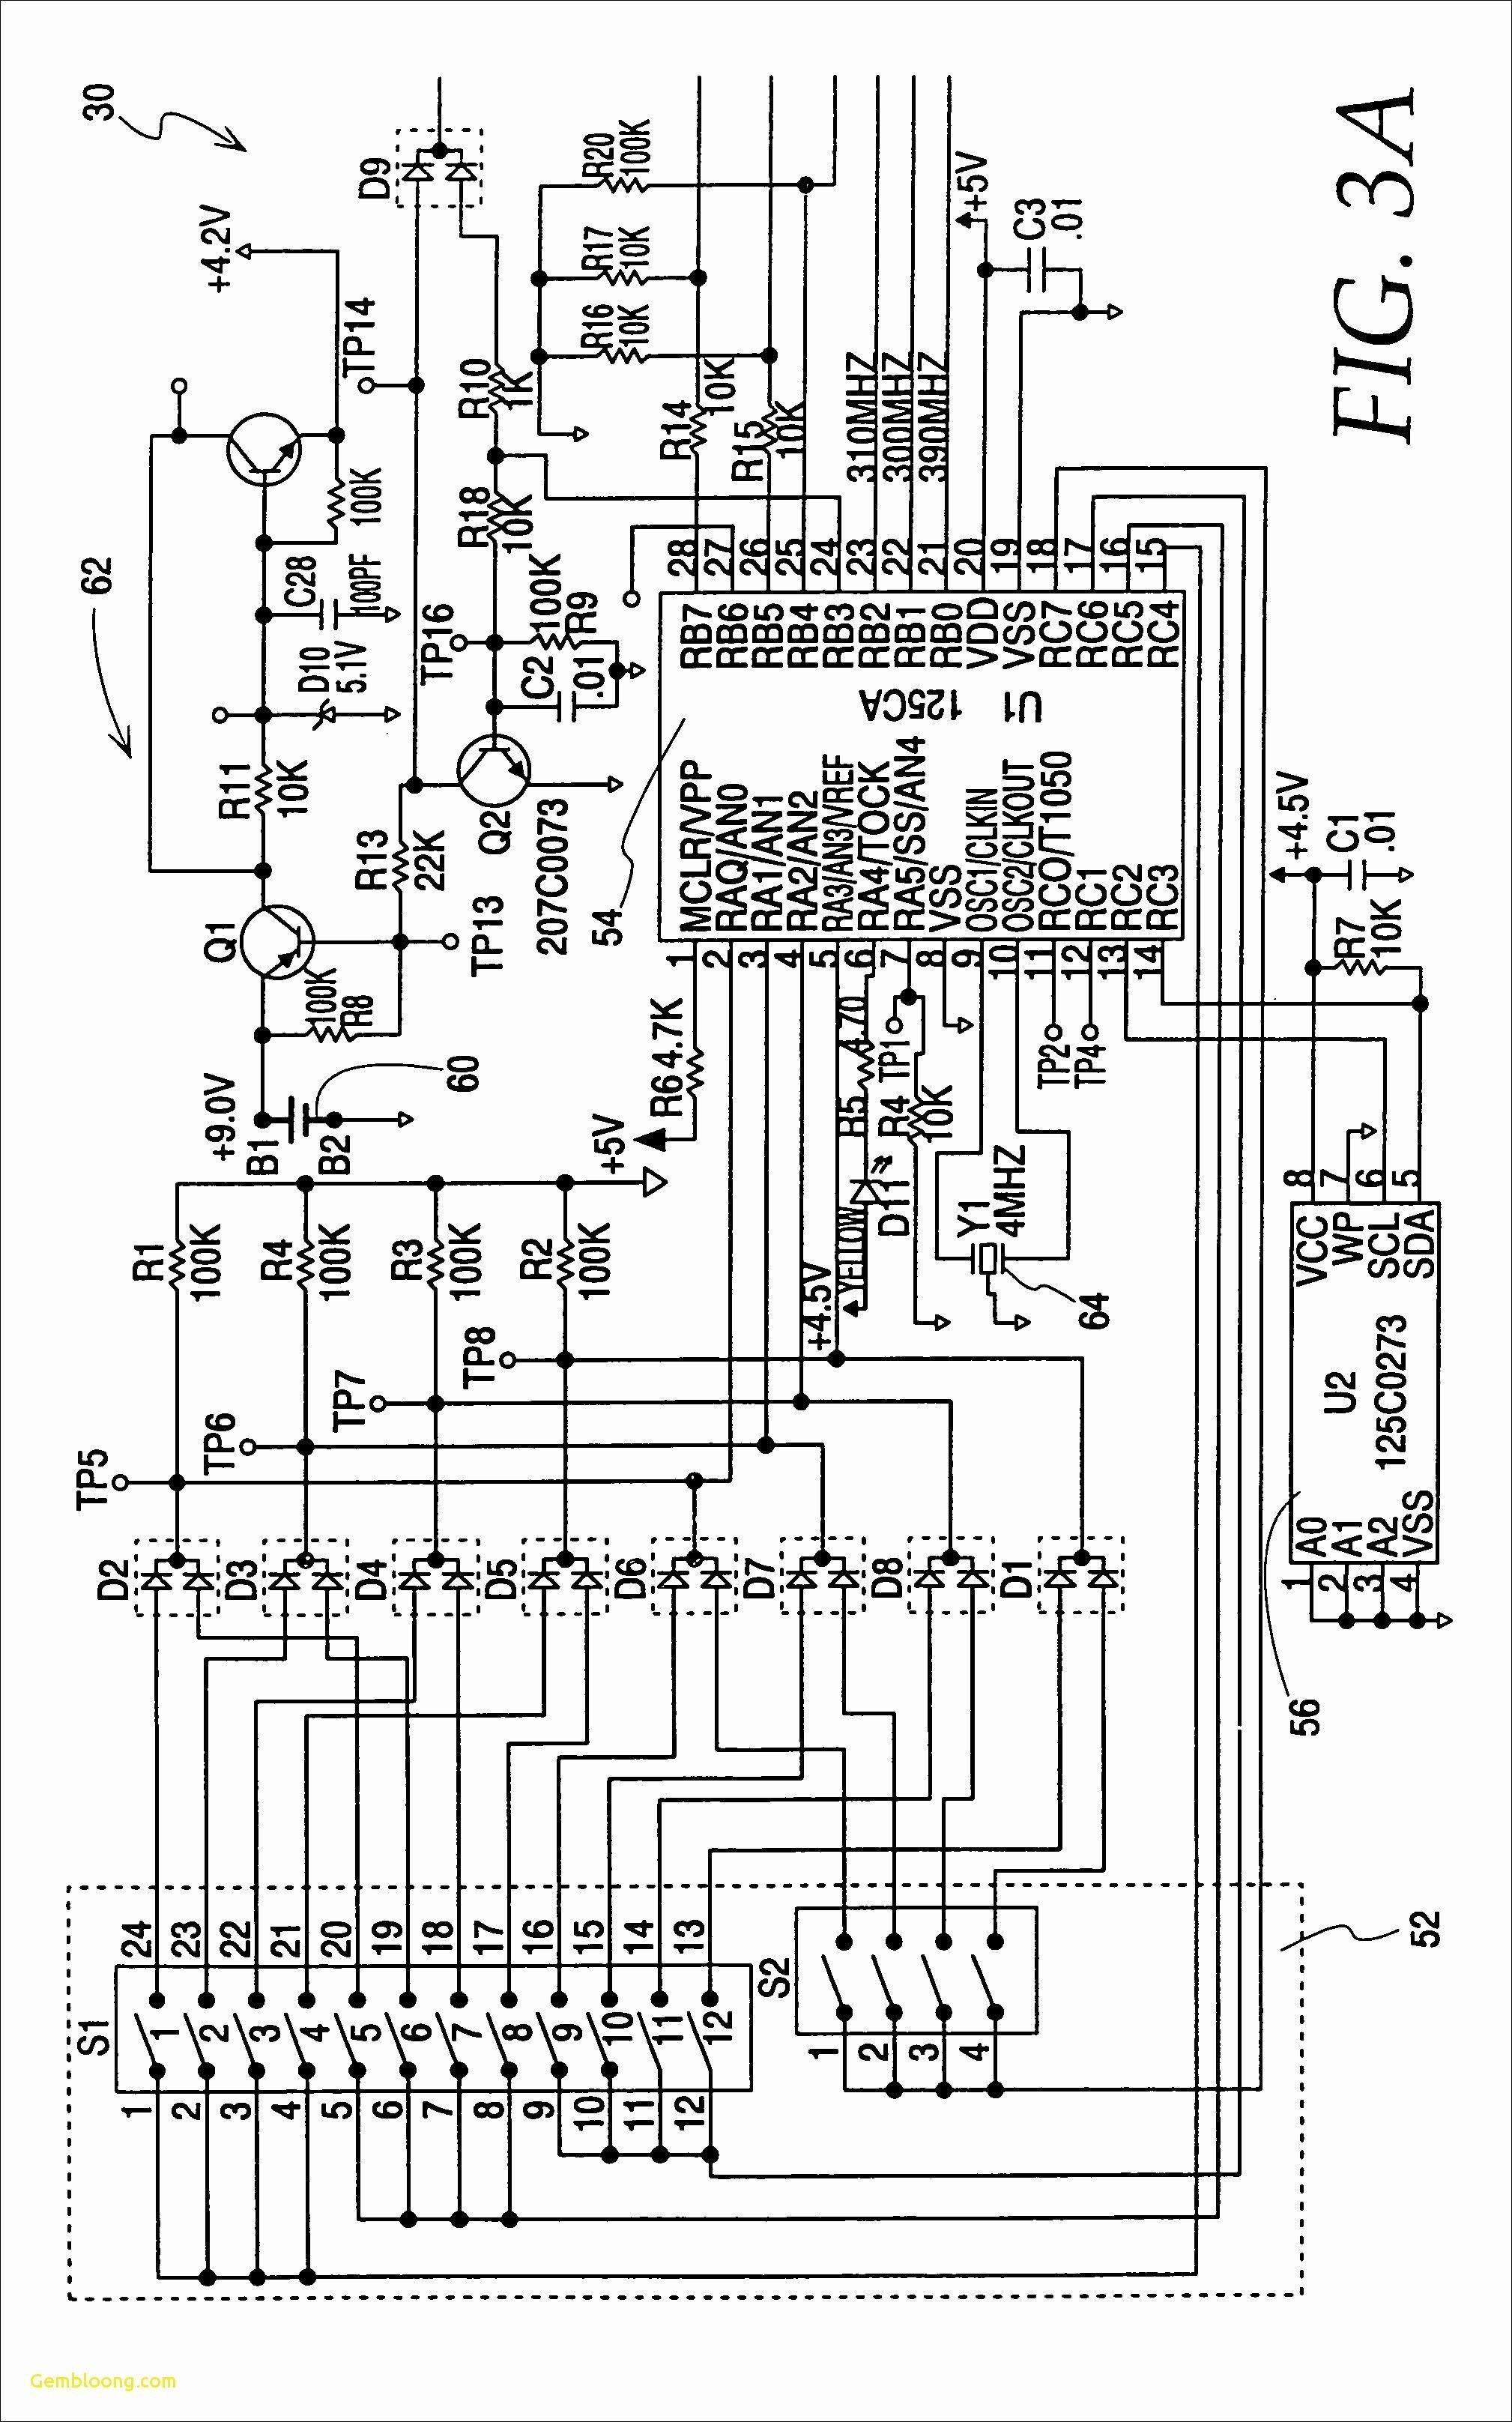 Vn Commodore Stoplight Wiring Diagram Grafick Defi Control Unit Wiring Diagram Full Version Hd Of Vn Commodore Stoplight Wiring Diagram